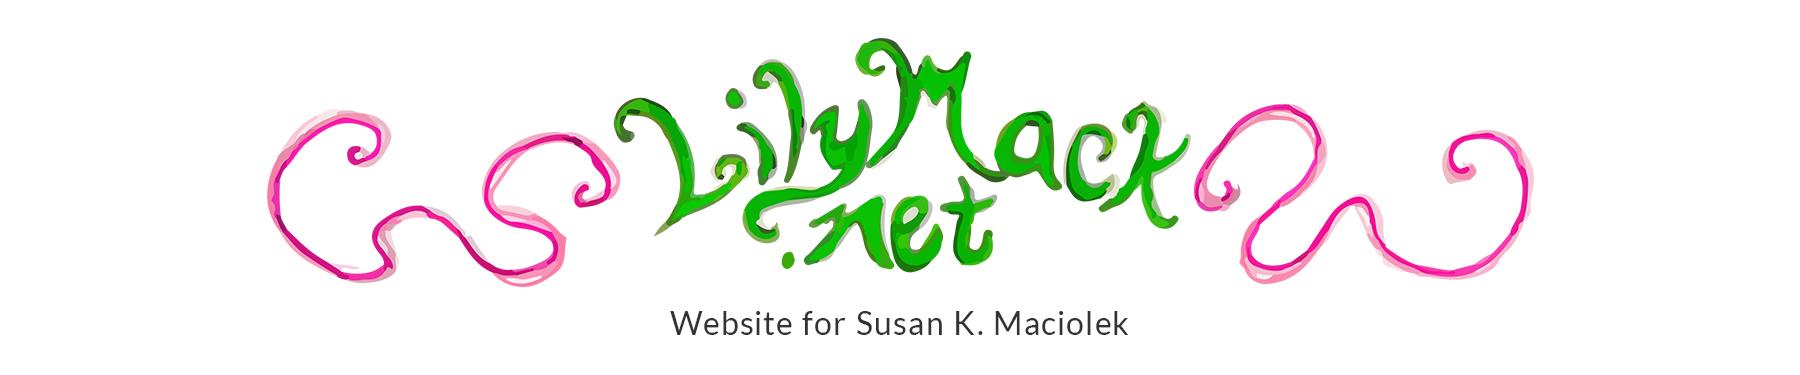 LilyMack.net